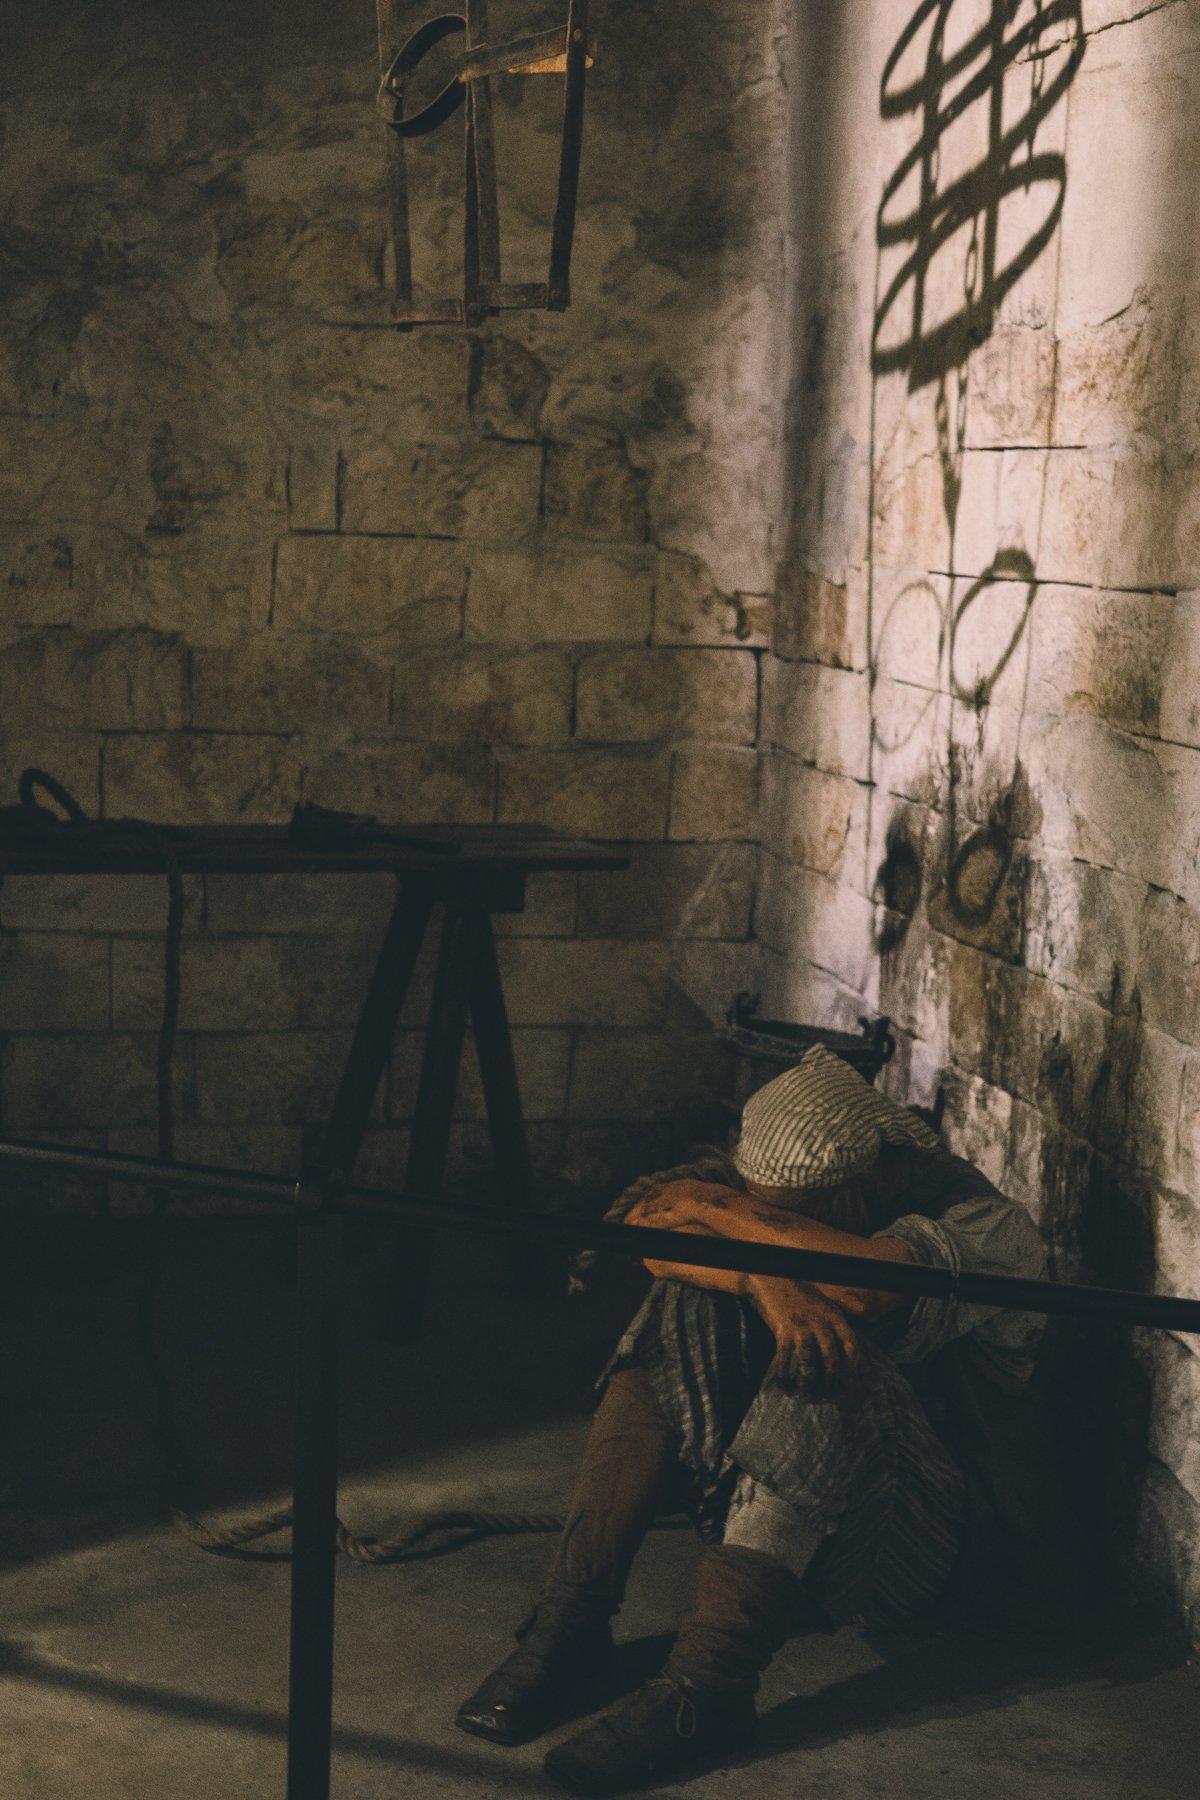 pirate's museum (12)